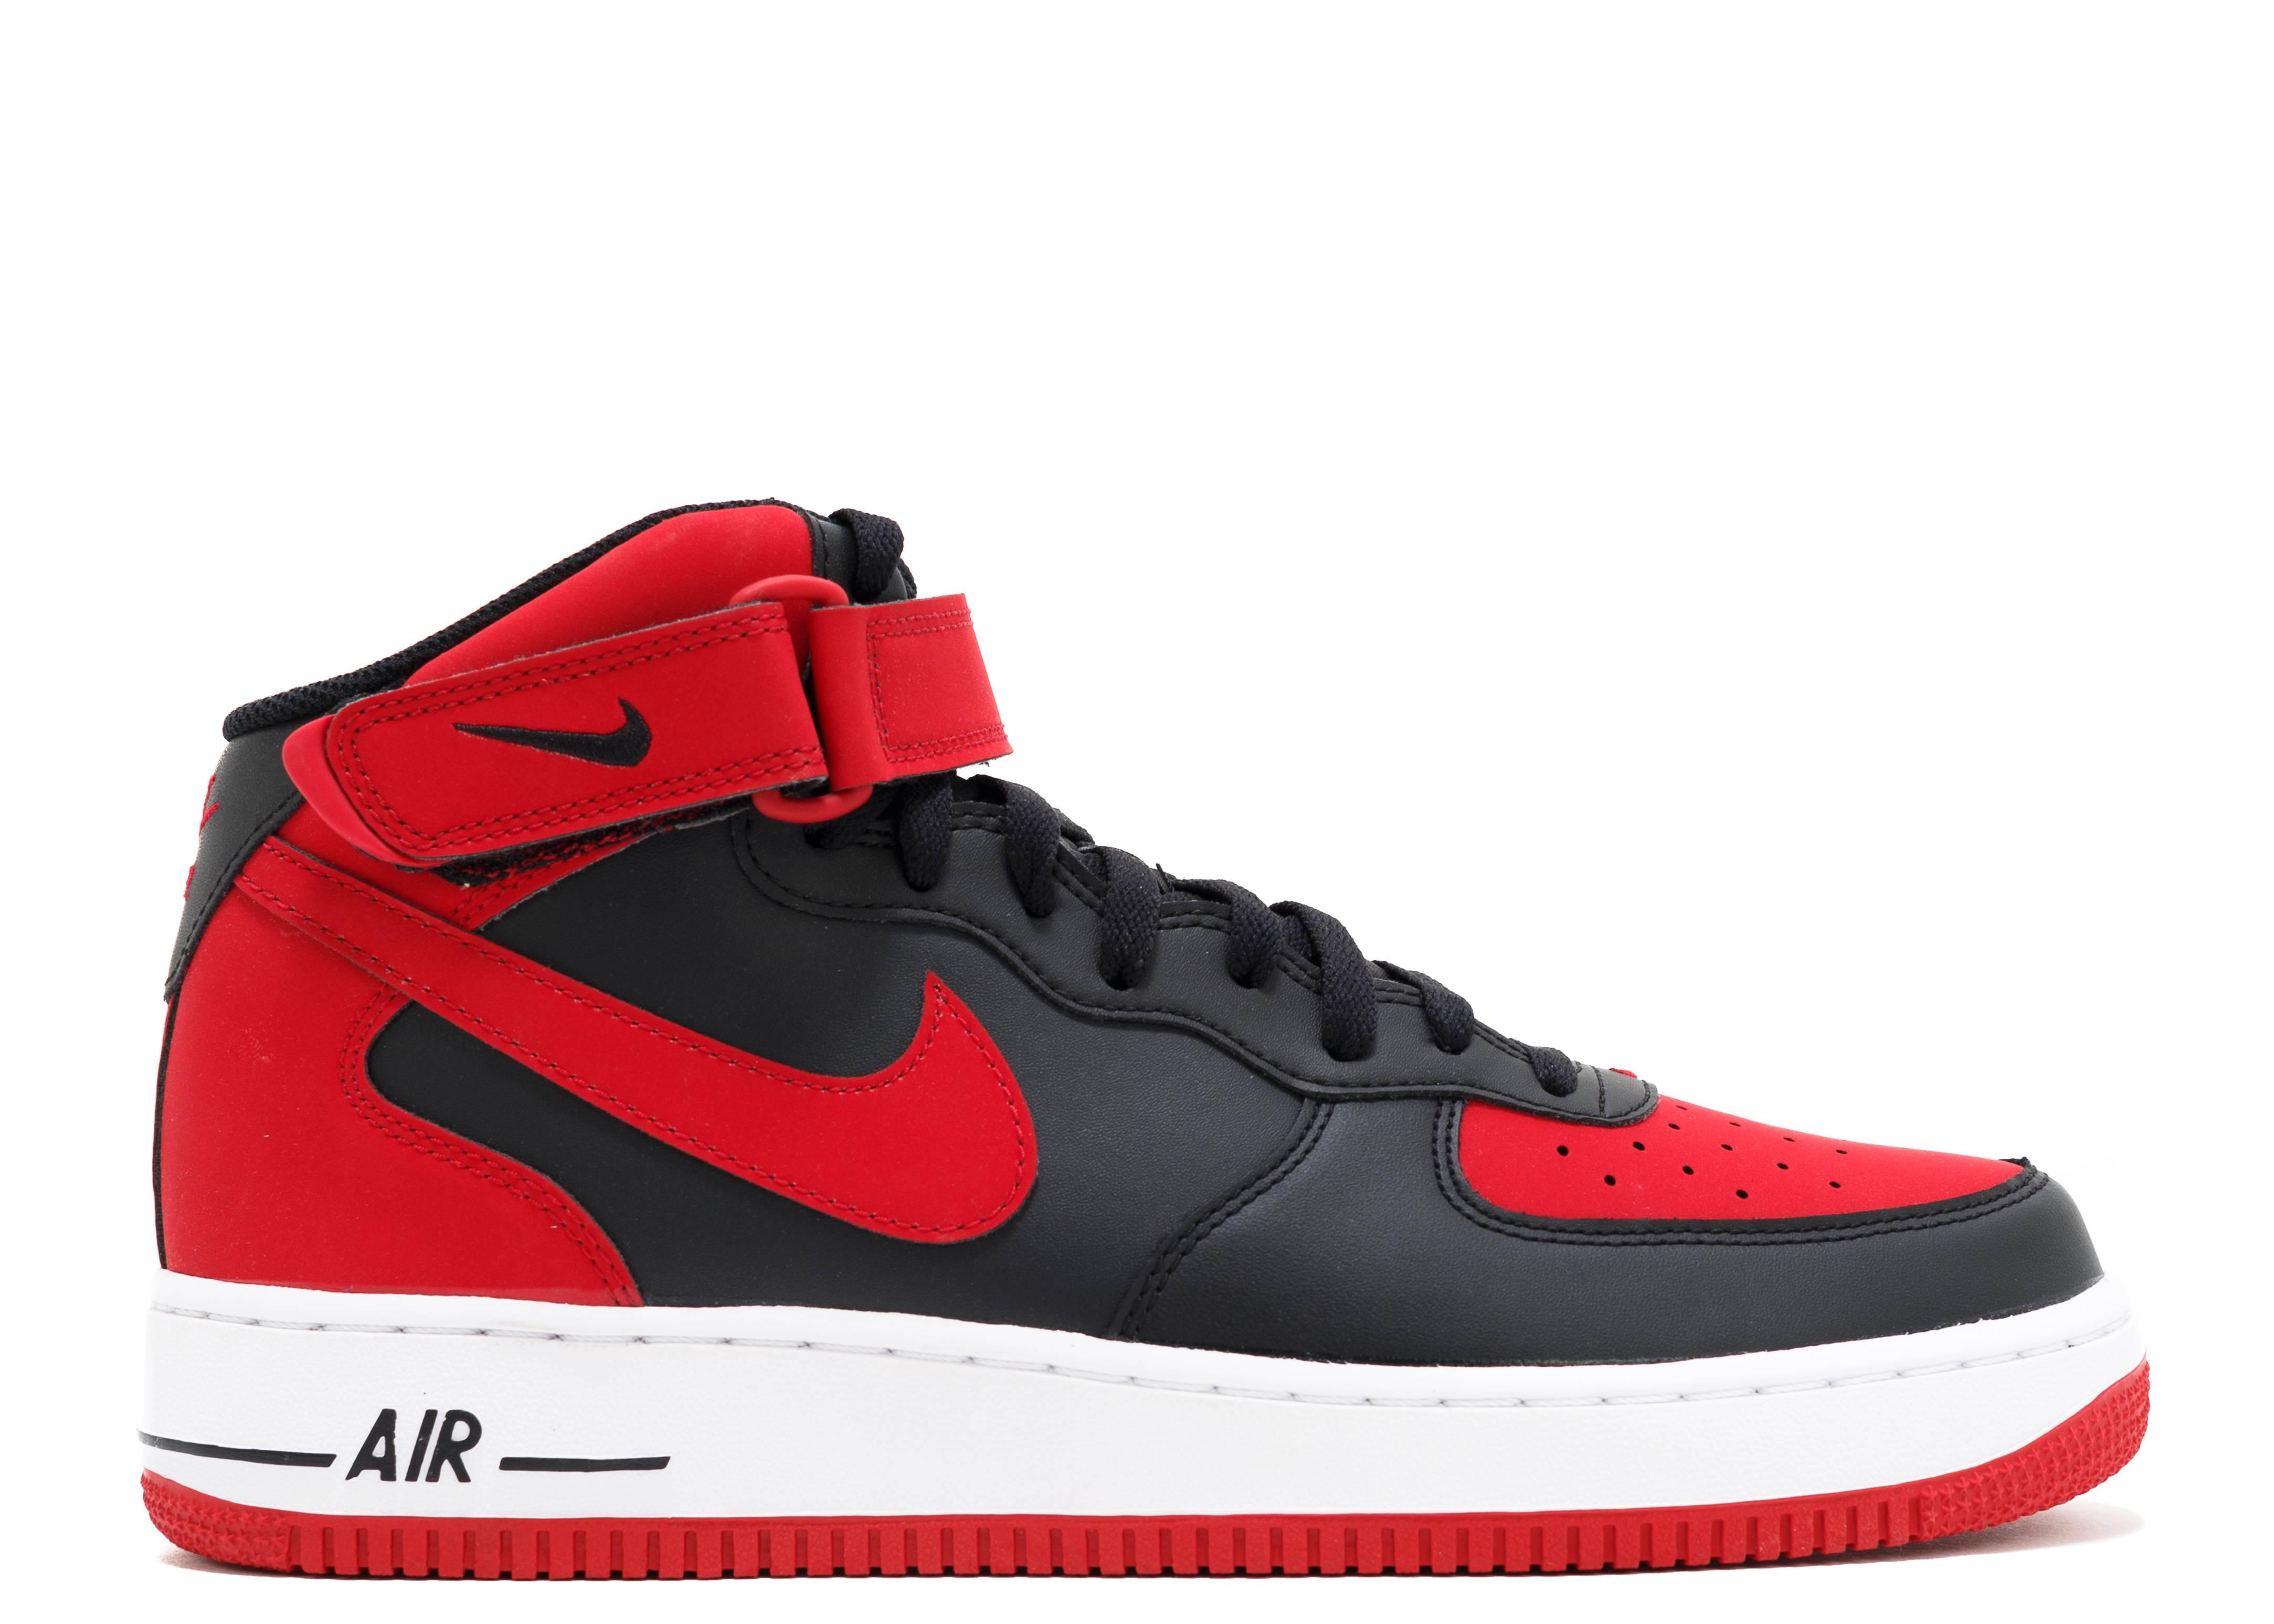 Air Force 1 Mid 07 Black Gym Red Nike 315123 029 Black